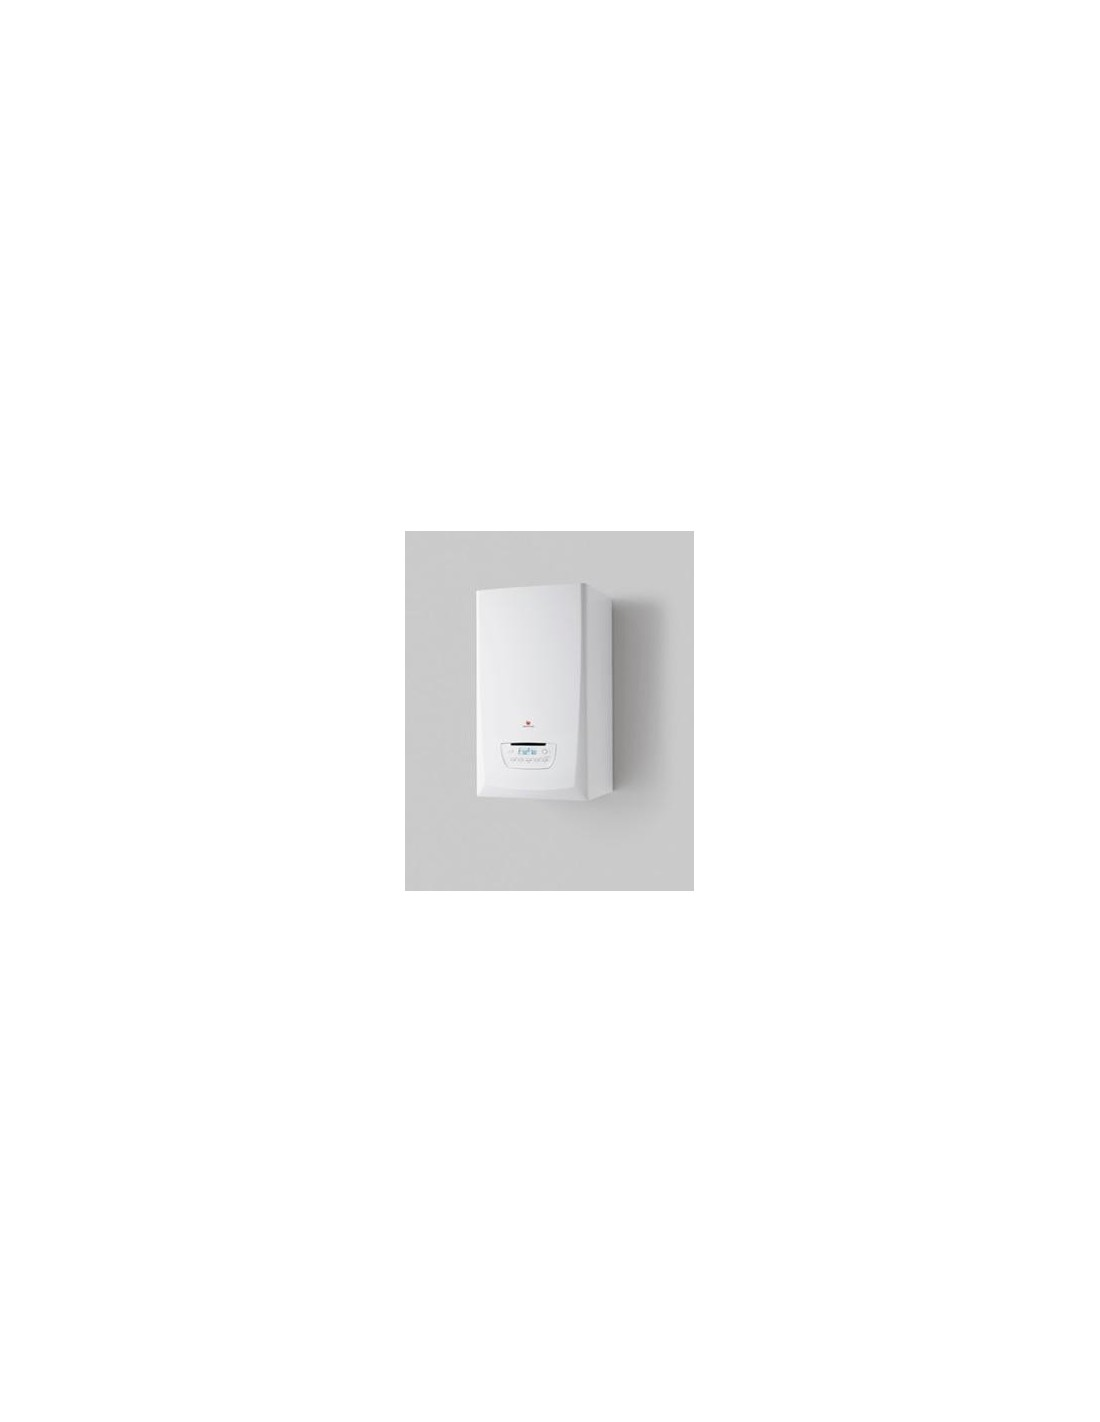 chaudi re murale gaz condensation thema plus condens saunier duval 25 kw ebay. Black Bedroom Furniture Sets. Home Design Ideas